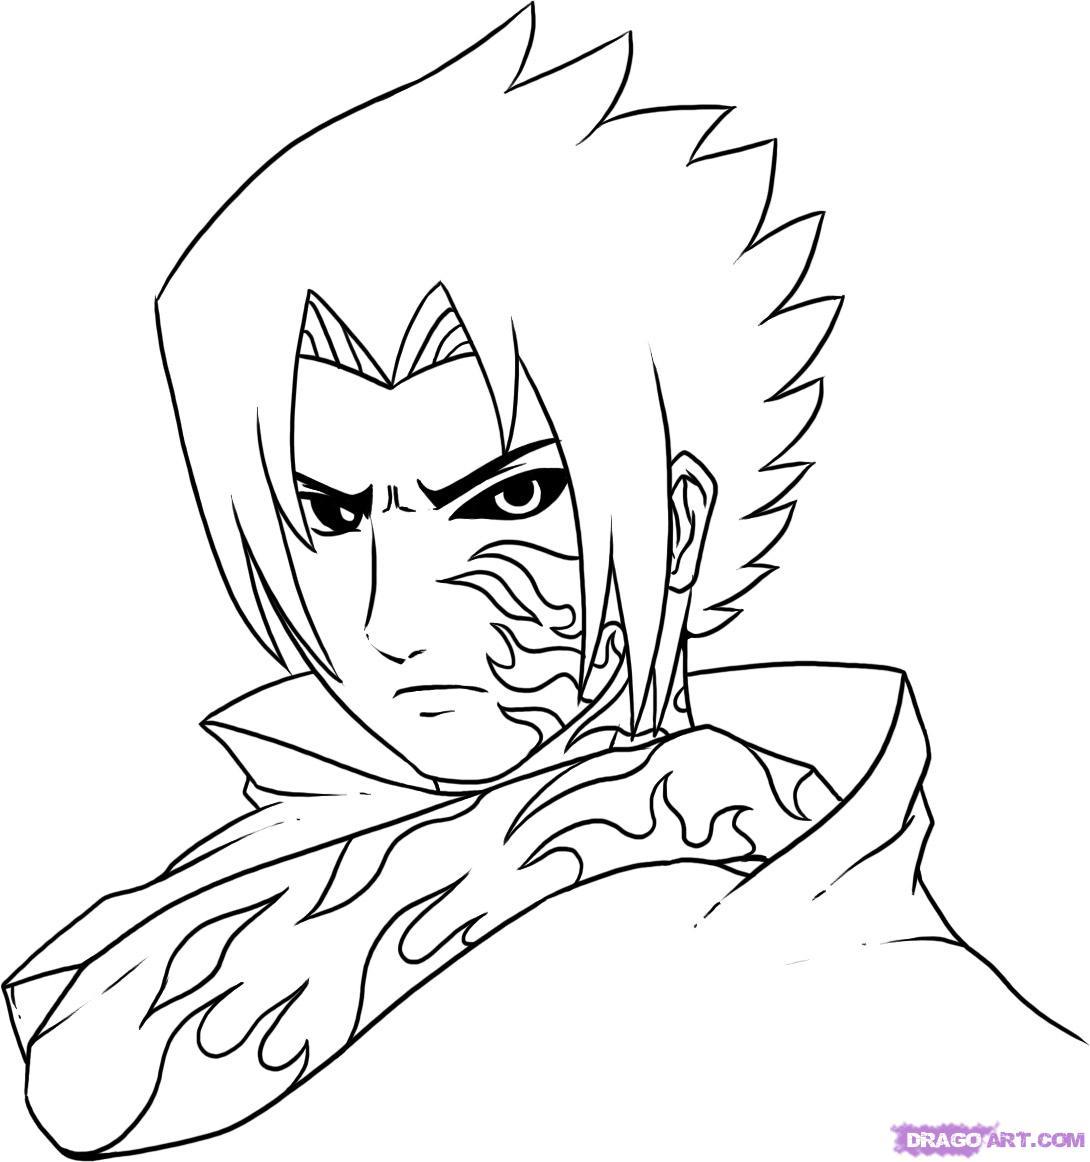 Drawn pice sasuke 6 by Curse Step Mark